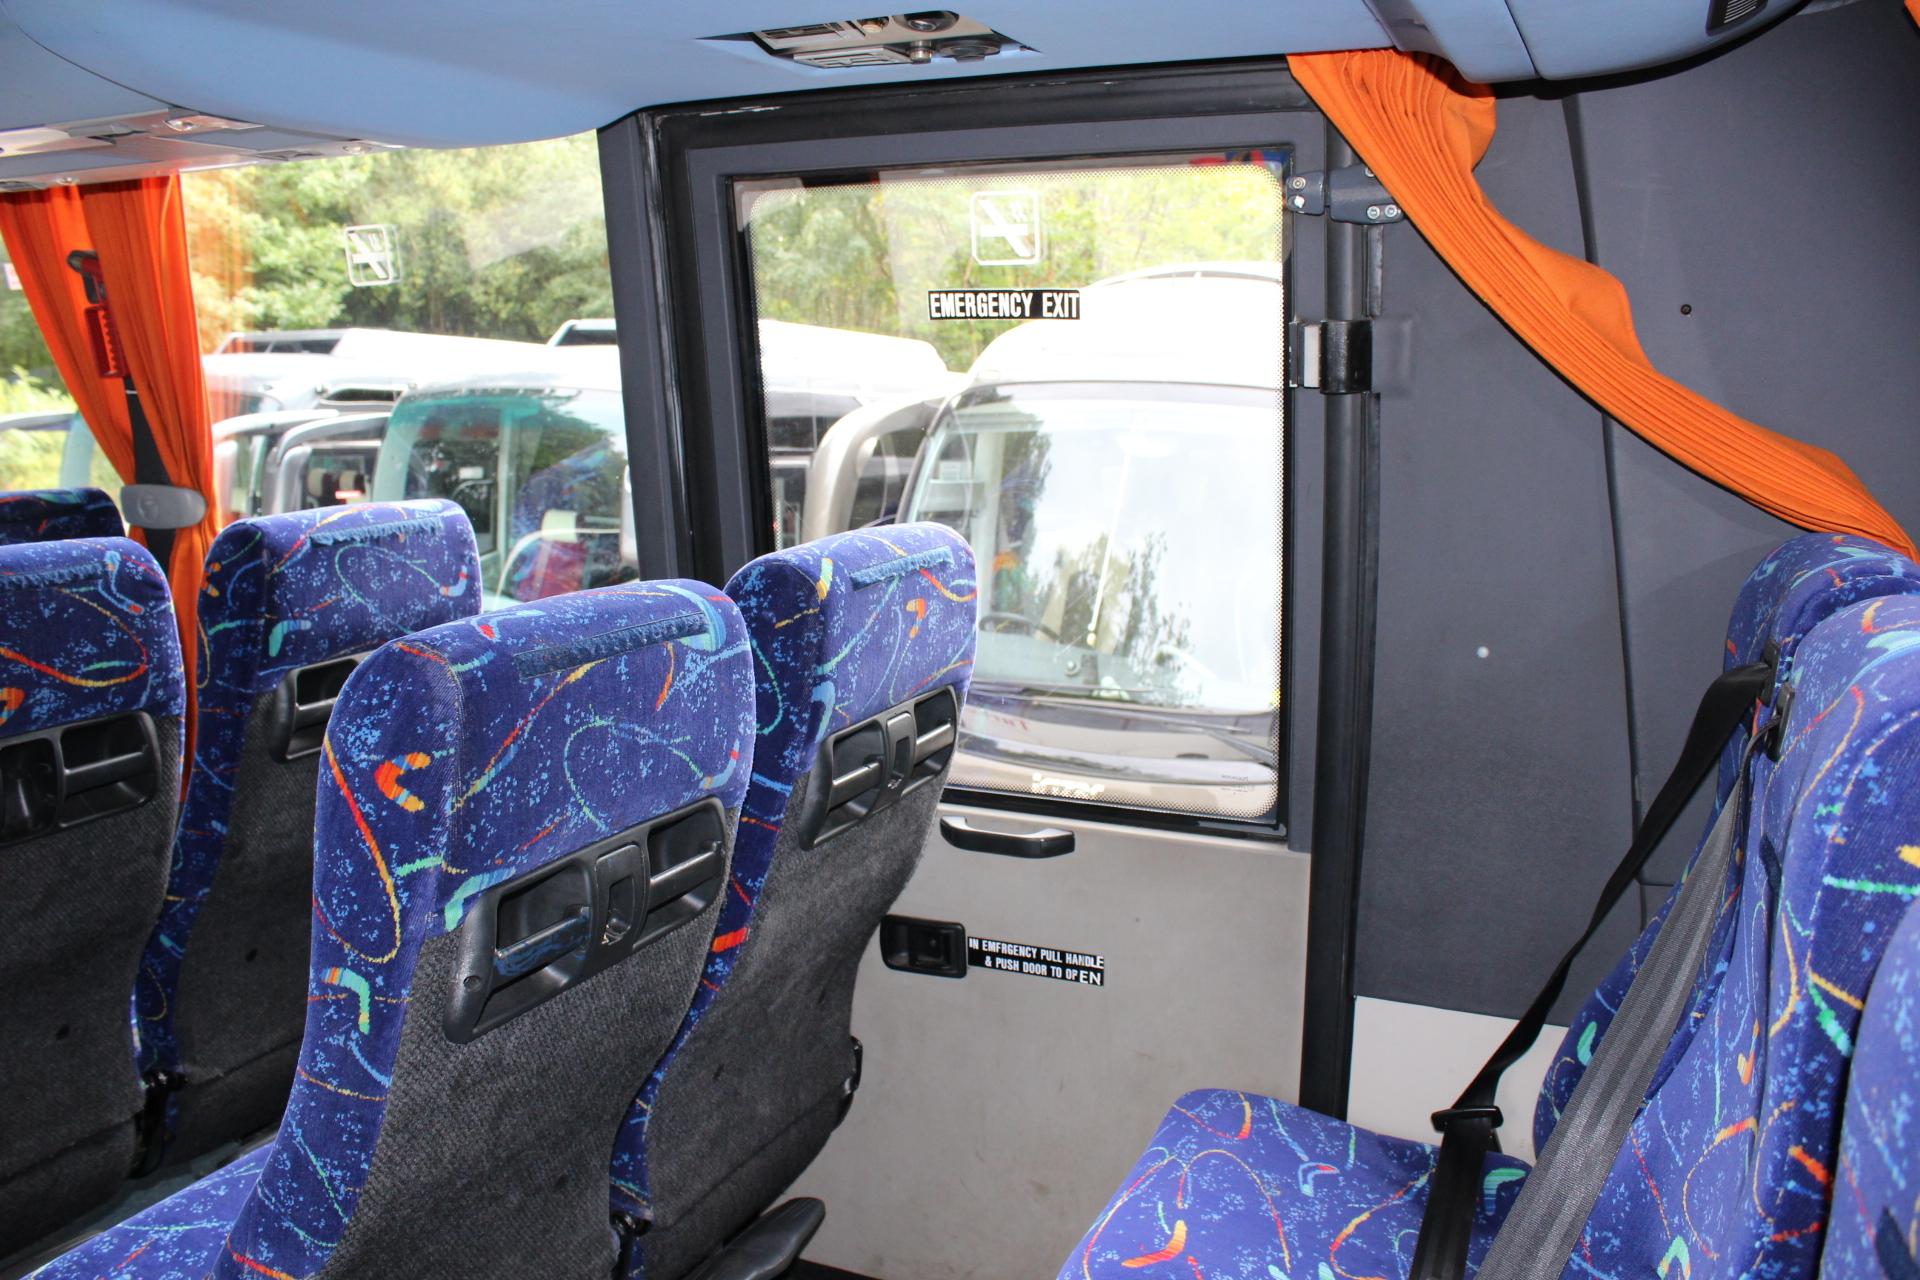 09 VOLVO B7R SUNSUNDEGUI SIDERAL 57 RECLINER - Hills Coaches